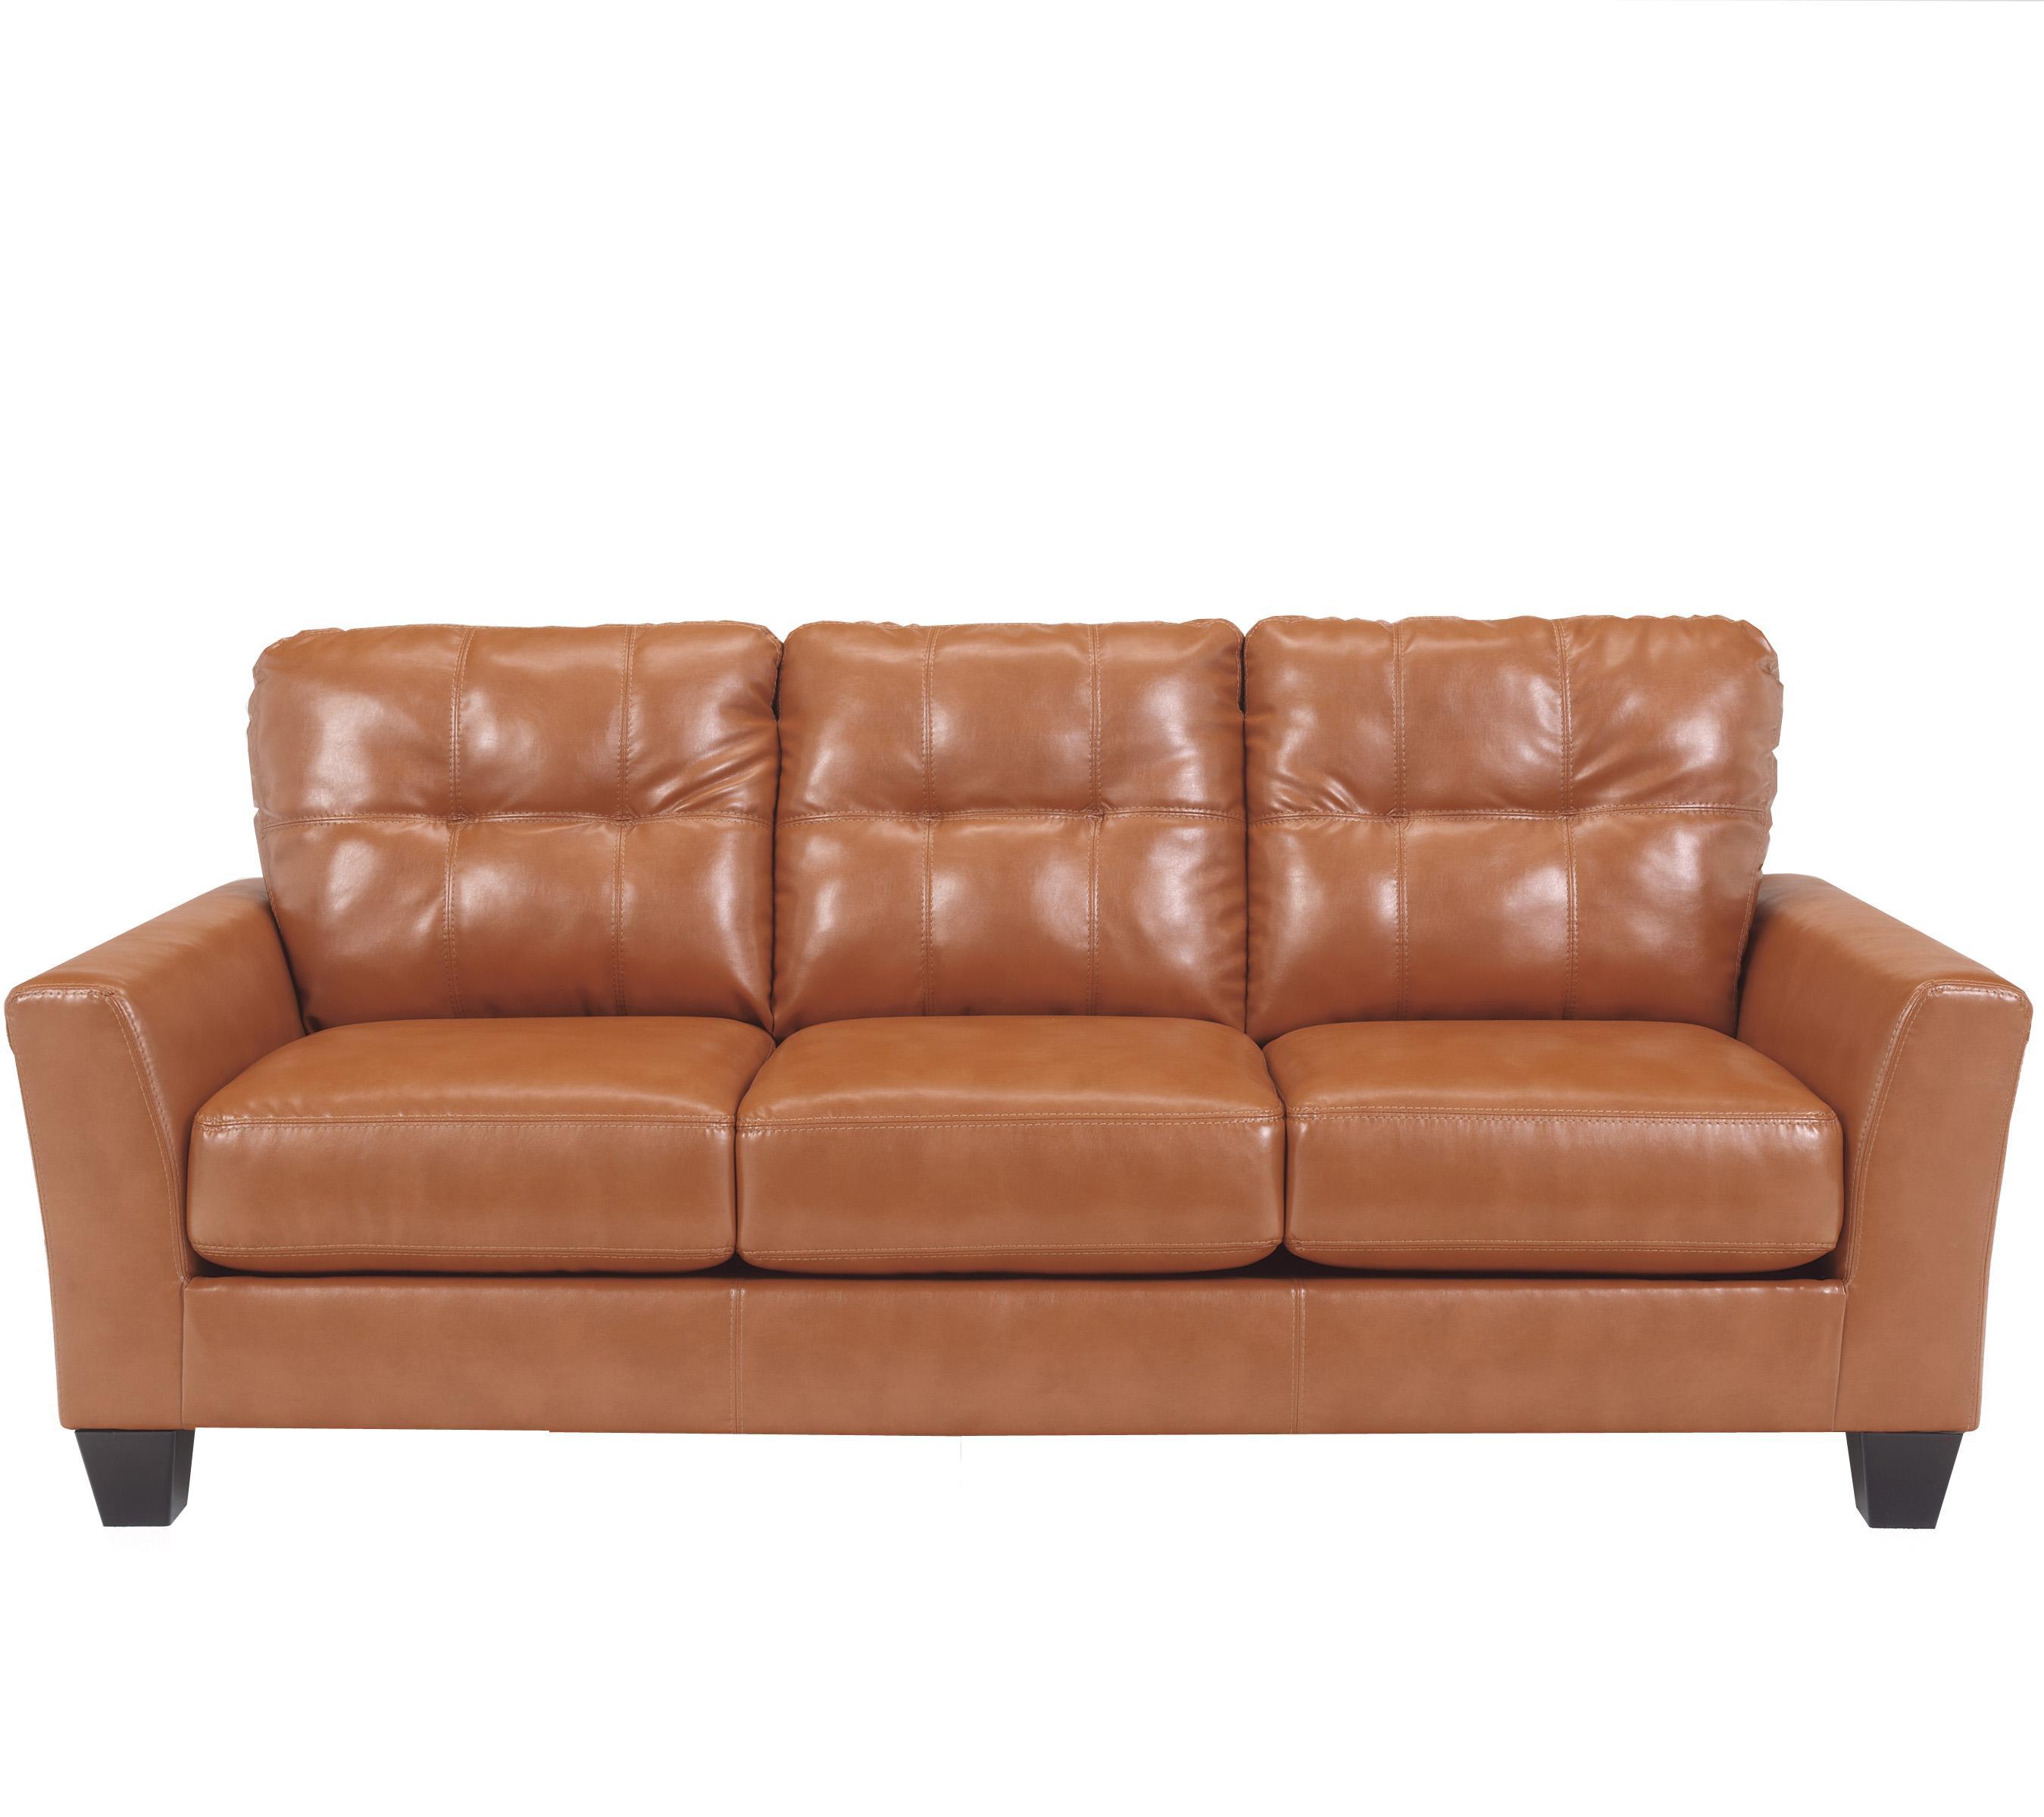 Benchcraft Paulie DuraBlend Orange Contemporary Sofa